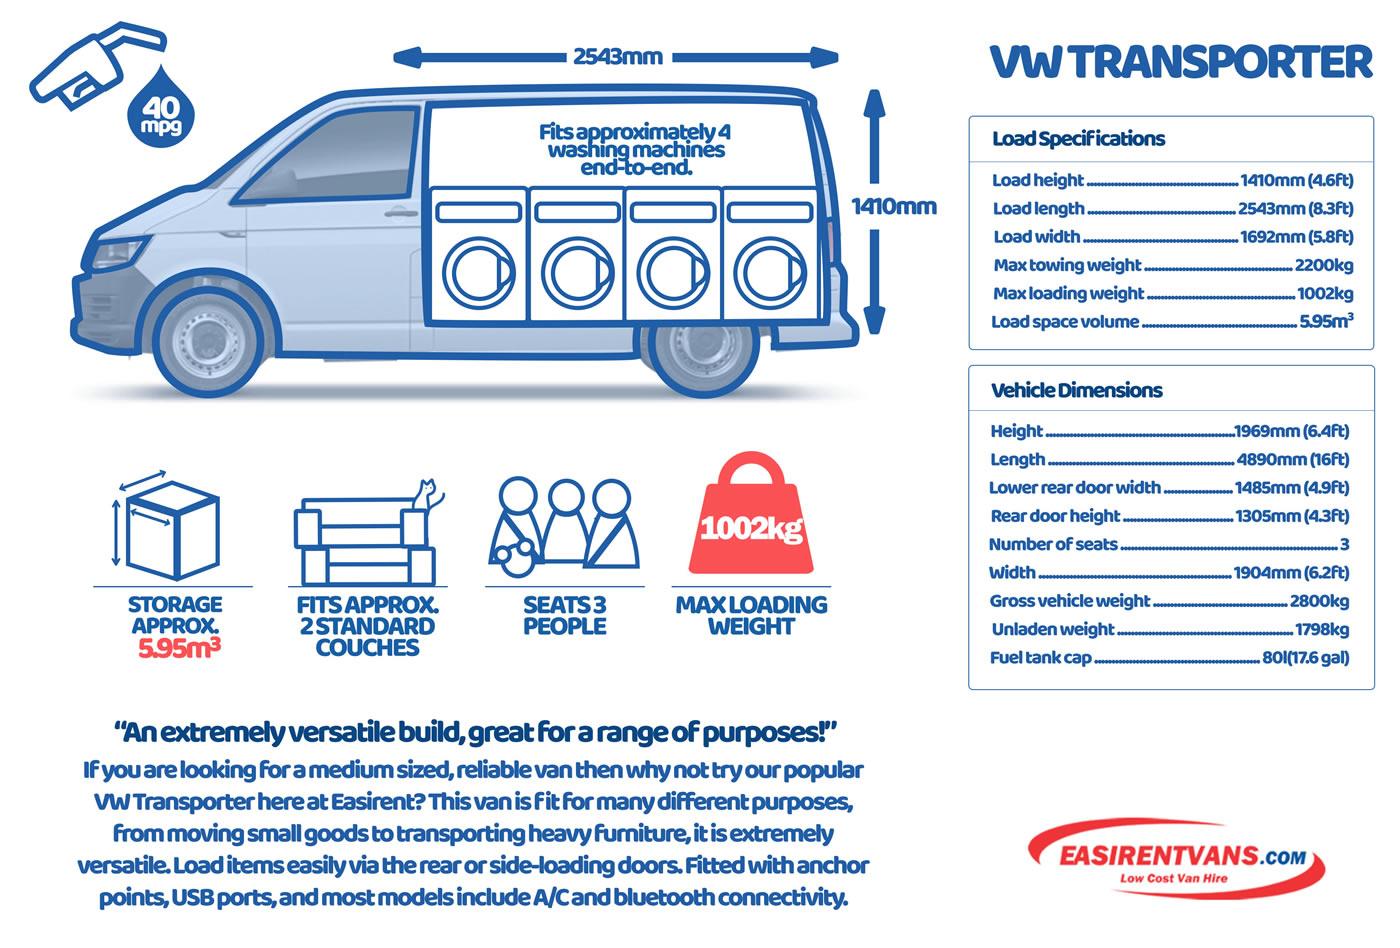 VW Transporter Specs